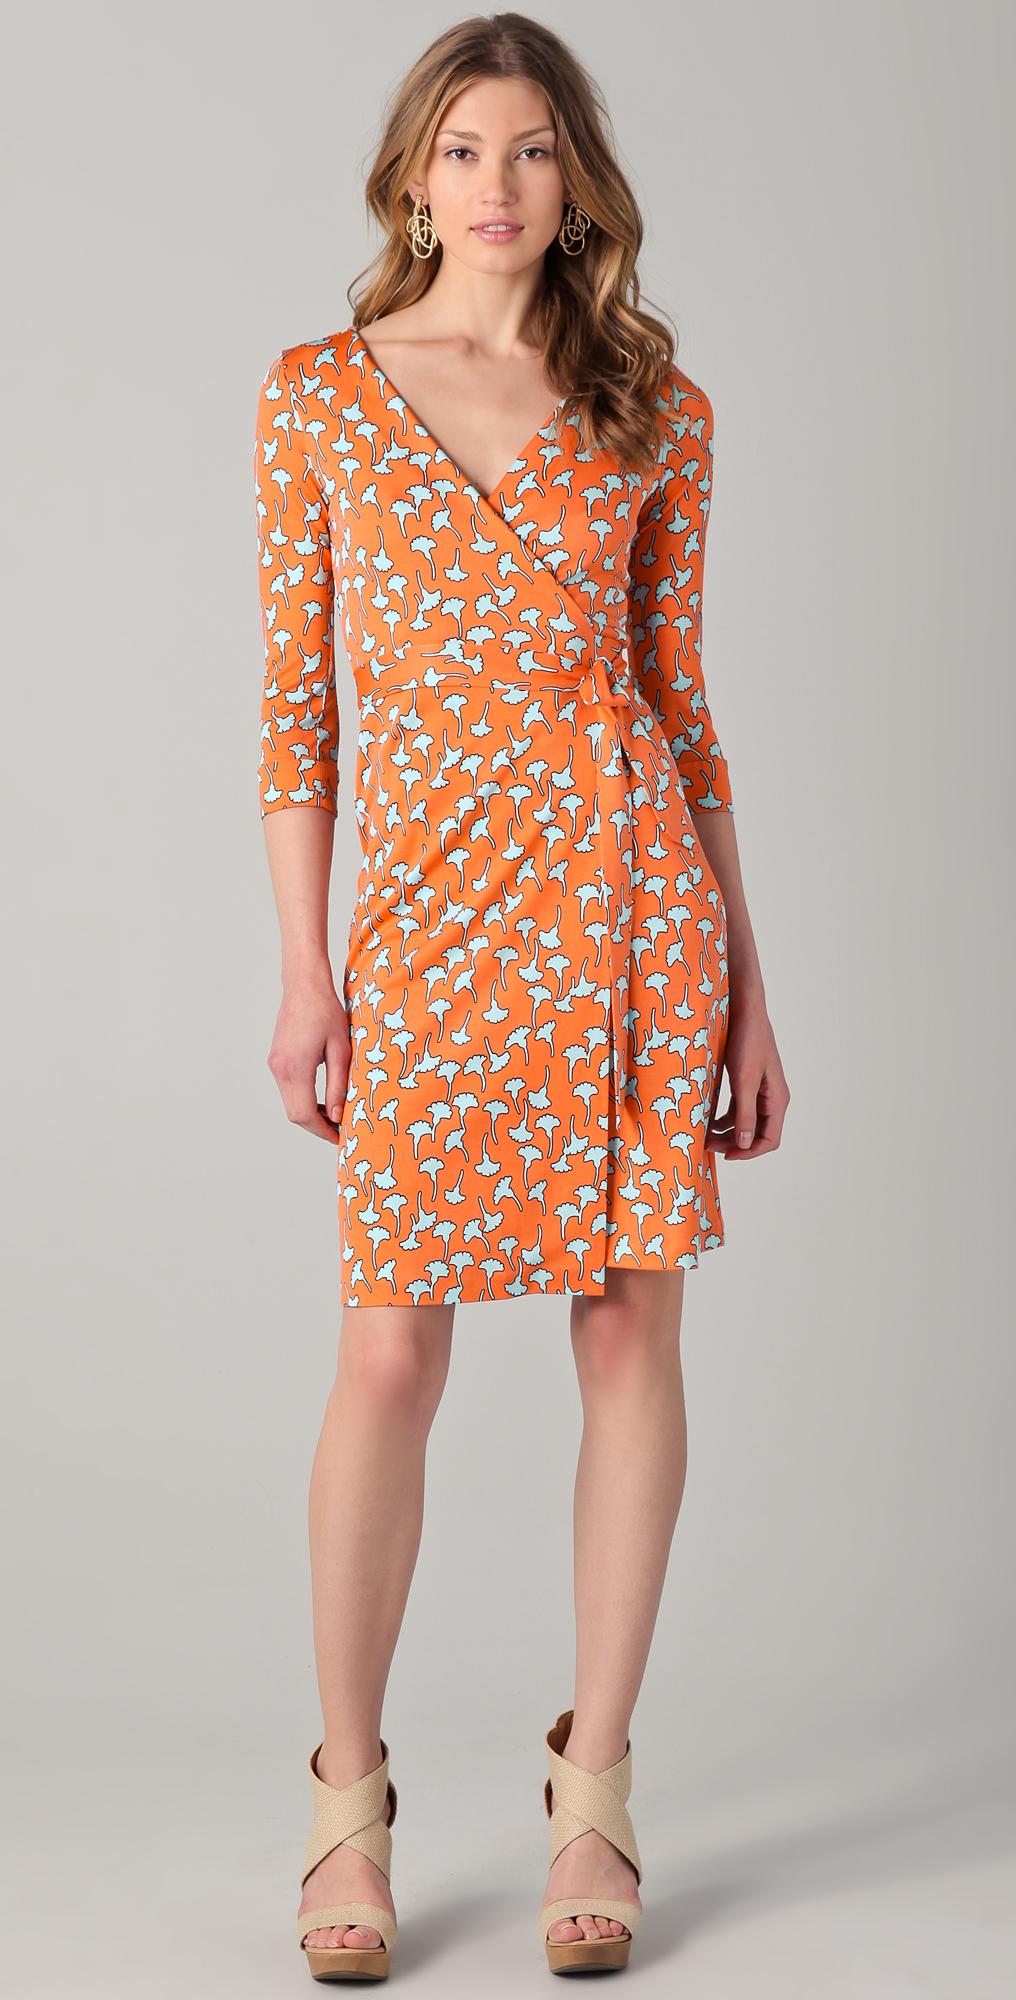 The wrap dress dvf - The Wrap Dress Dvf 56